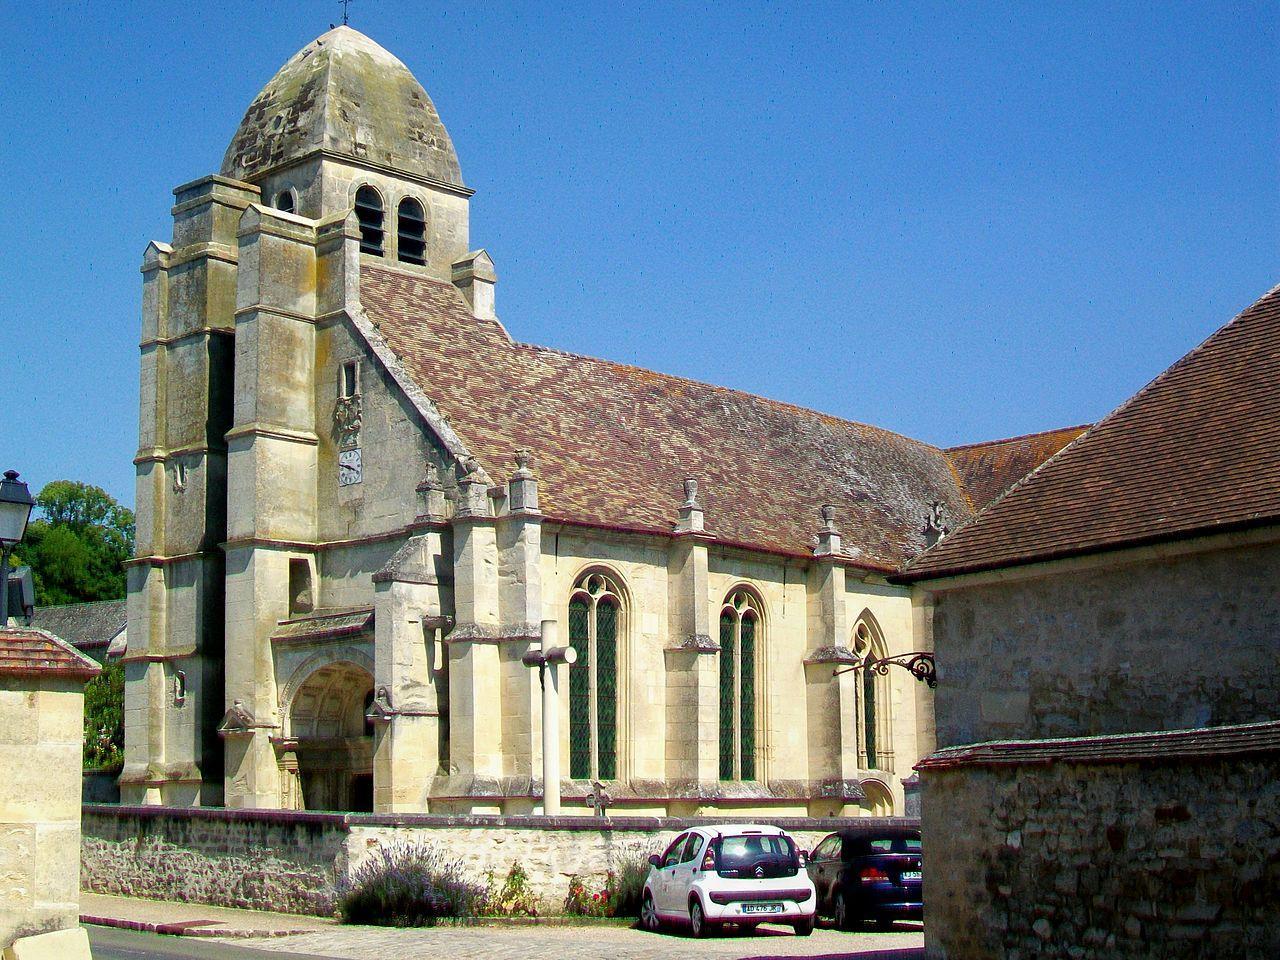 Eglise st nicolas rue st nicolas